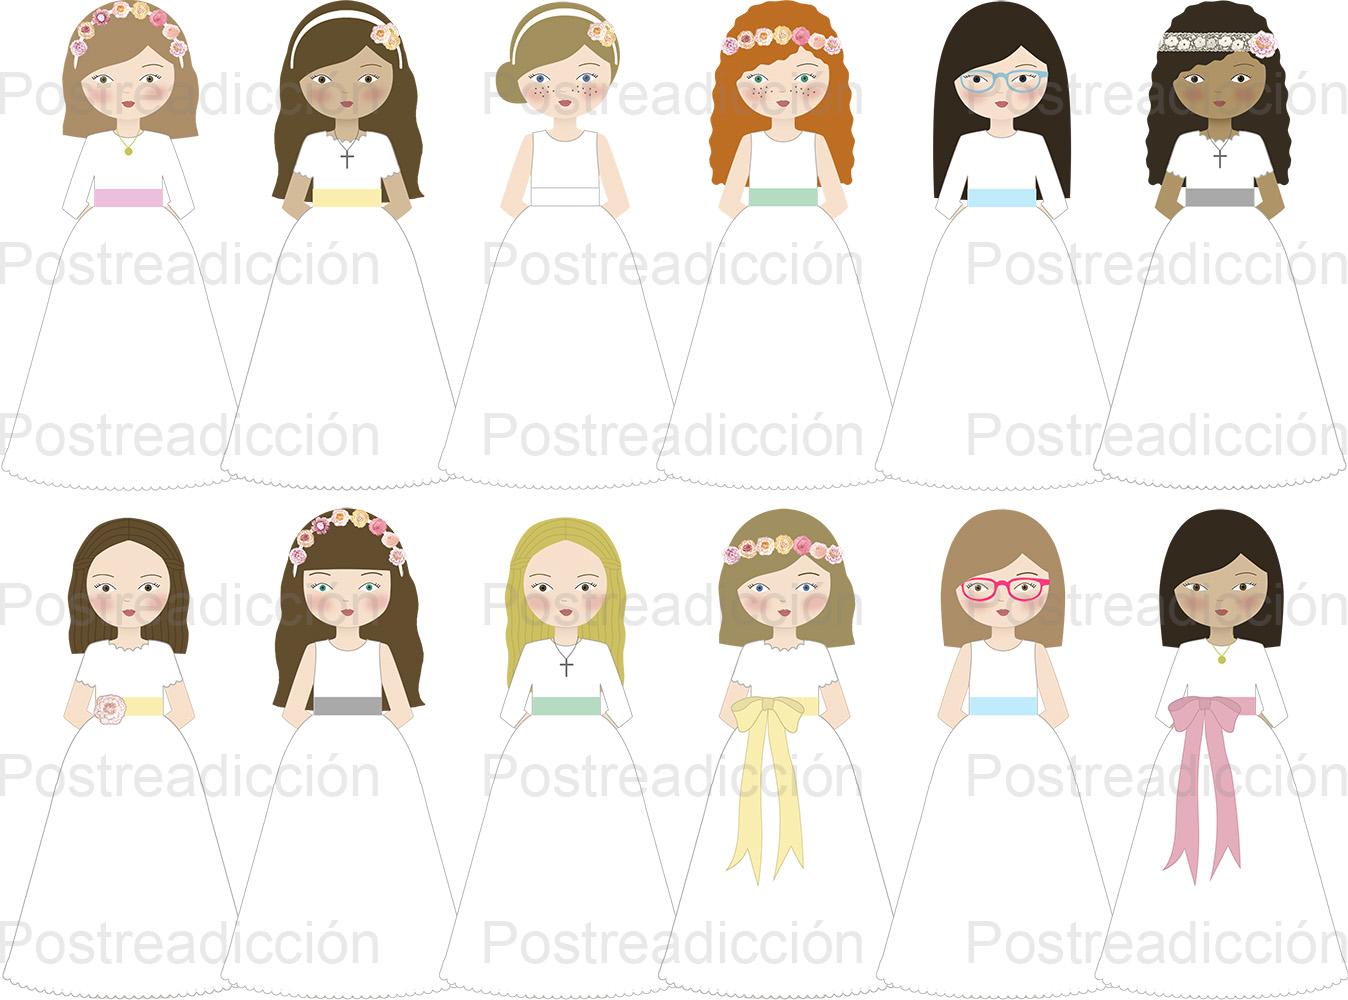 Imagen de producto: https://tienda.postreadiccion.com/img/articulos/secundarias6719-5-espejitos-de-nina-de-comunion-carlota-modelo-no-849-1.jpg